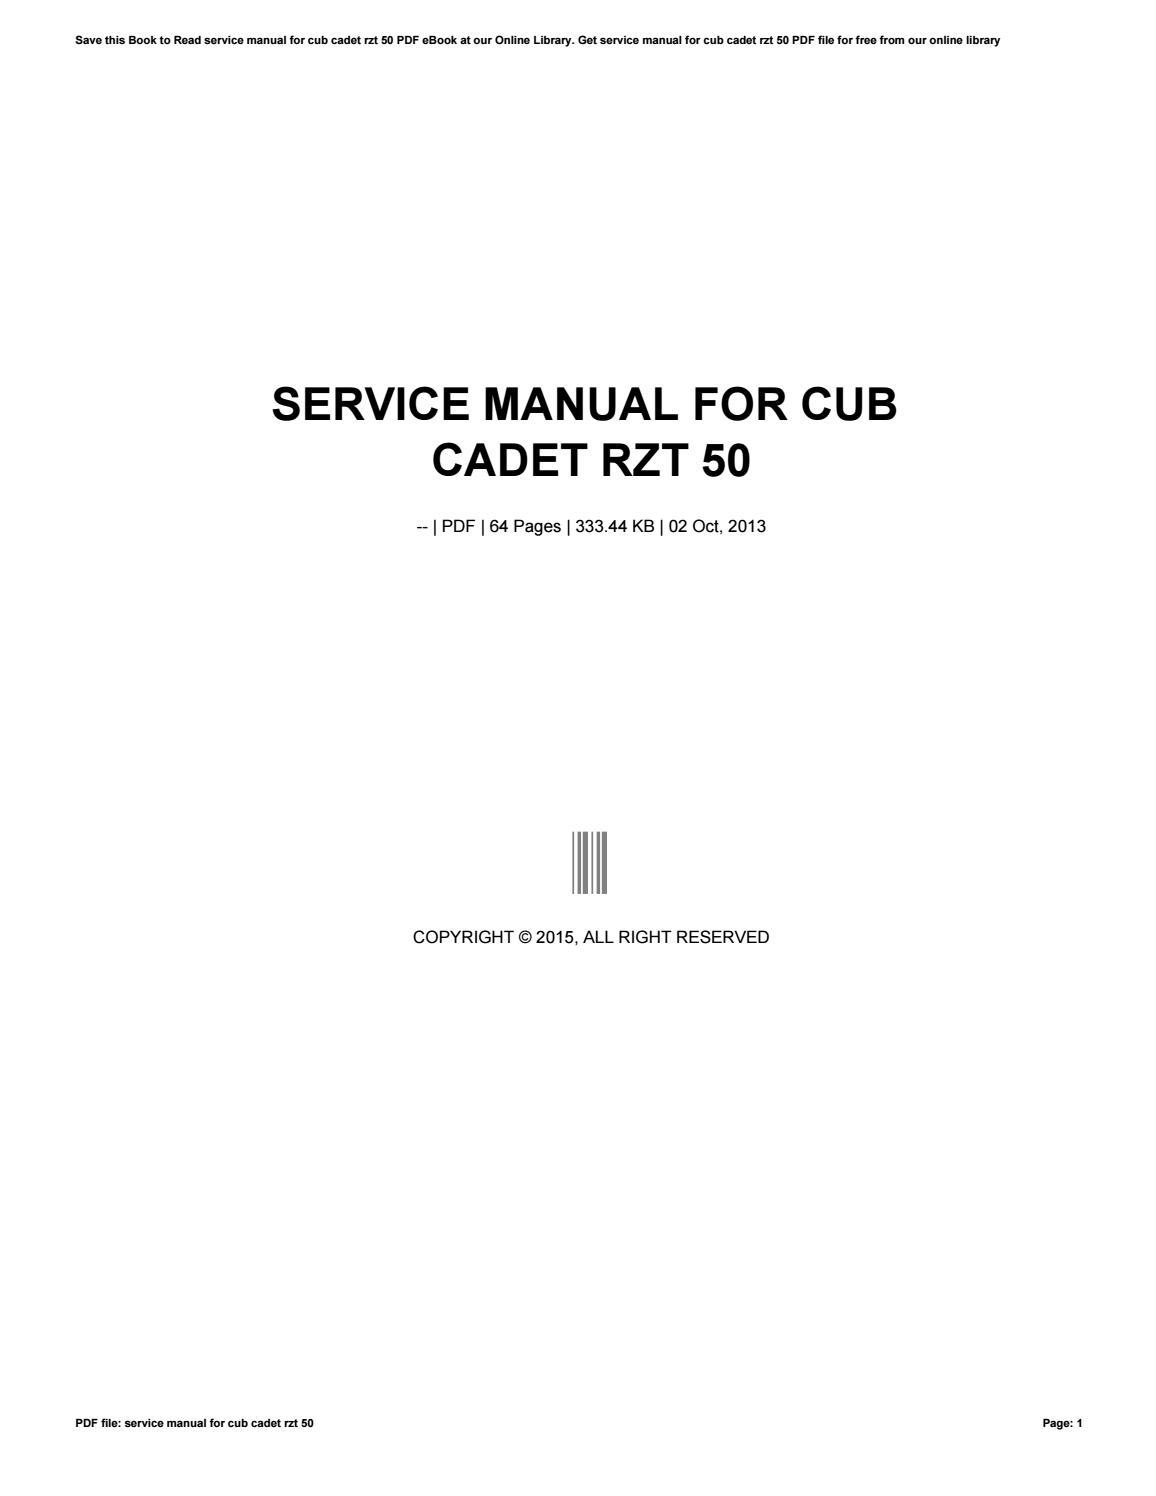 [SCHEMATICS_44OR]  Service manual for cub cadet rzt 50 by e-mailbox43 - issuu | Cub Cadet Rzt 50 Schematic |  | Issuu